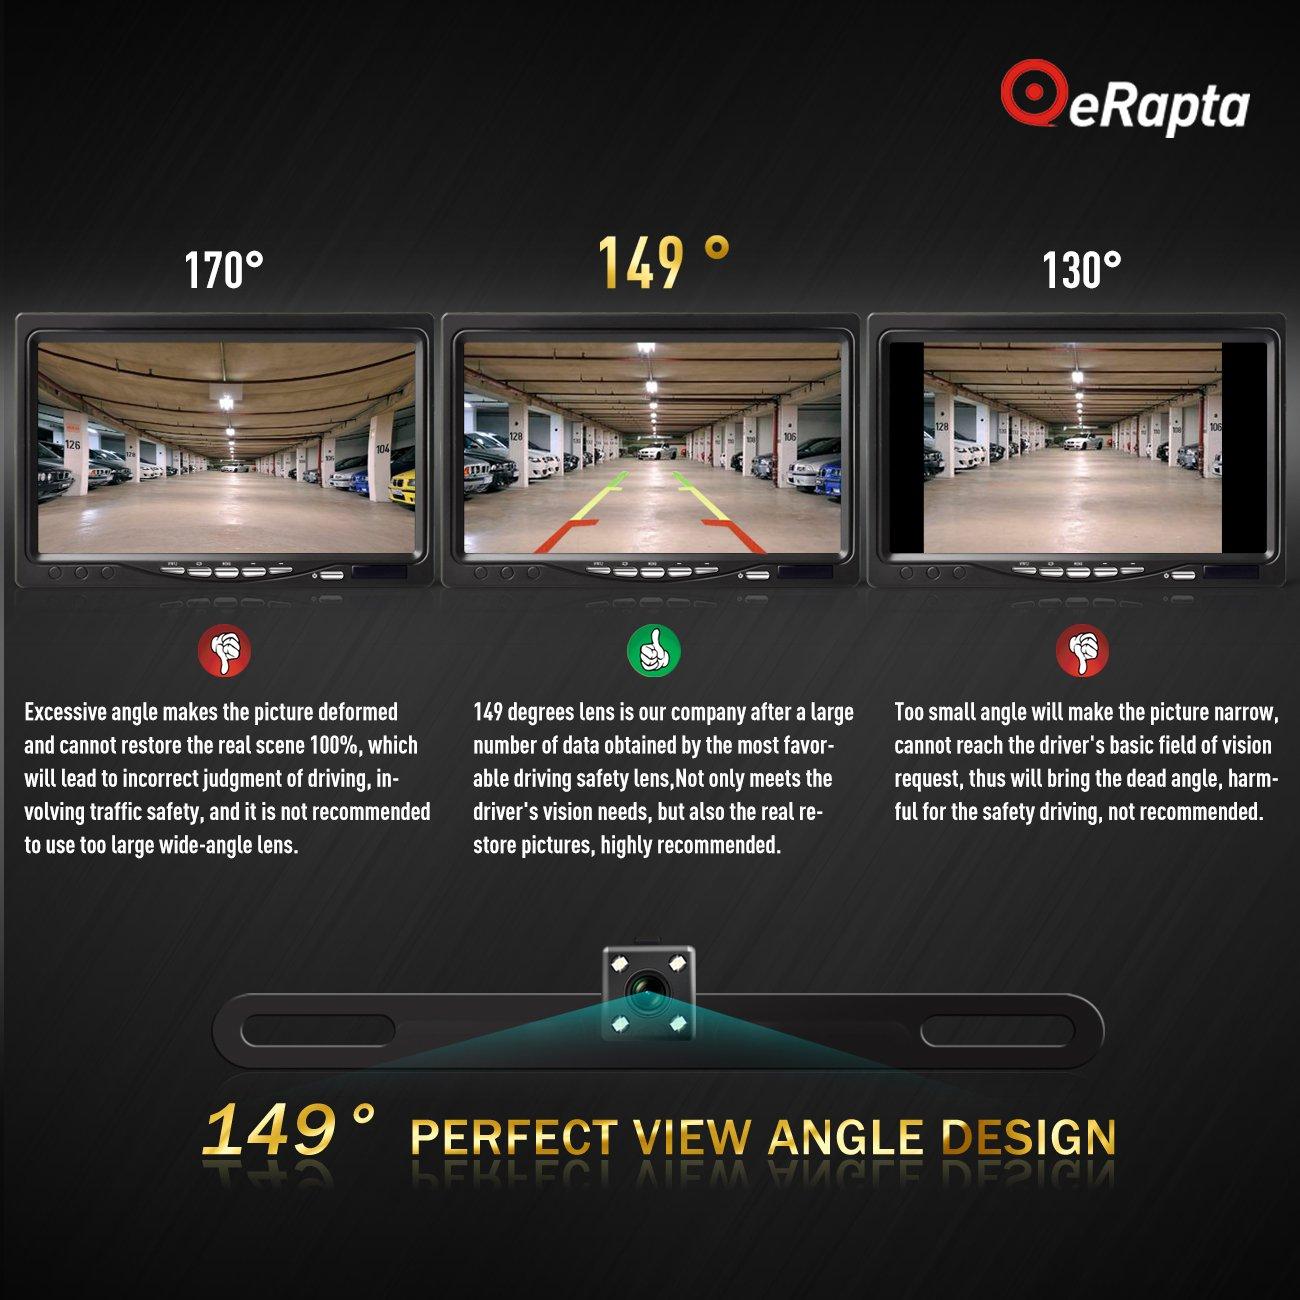 eRapta ERT3 2nd Generation Rear Reversing Backup 149°Perfect View Angle Design 4 LED Lights Night Vision 9 Level Waterproof Car Dash Security Sensor Back up Camera by eRapta (Image #3)